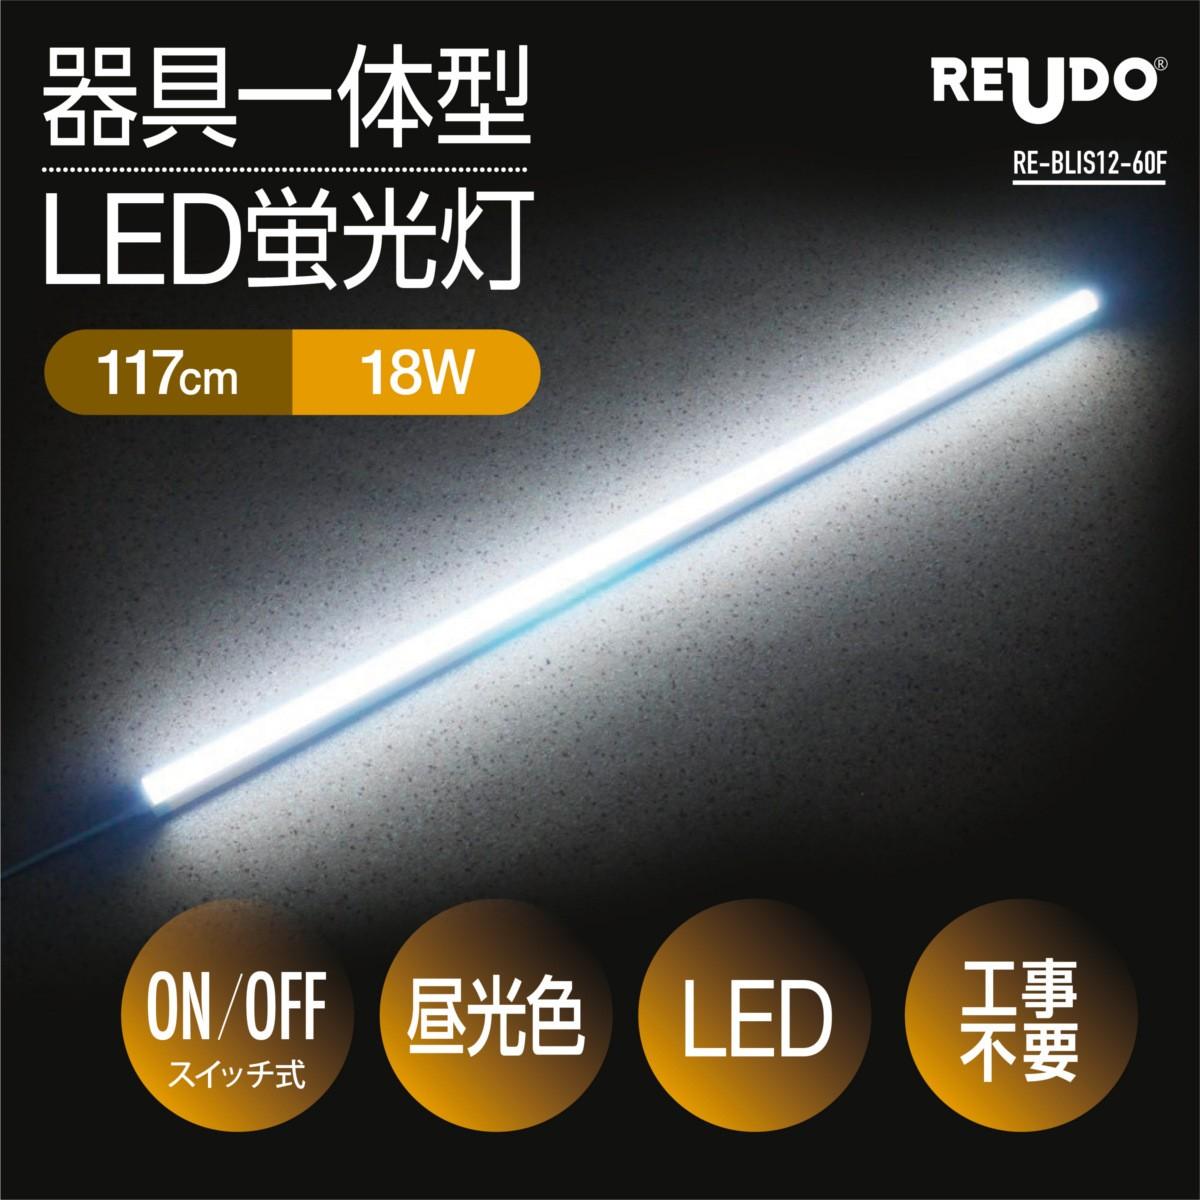 LED蛍光灯 スイッチ付器具一体型 長さ117cm 昼光色